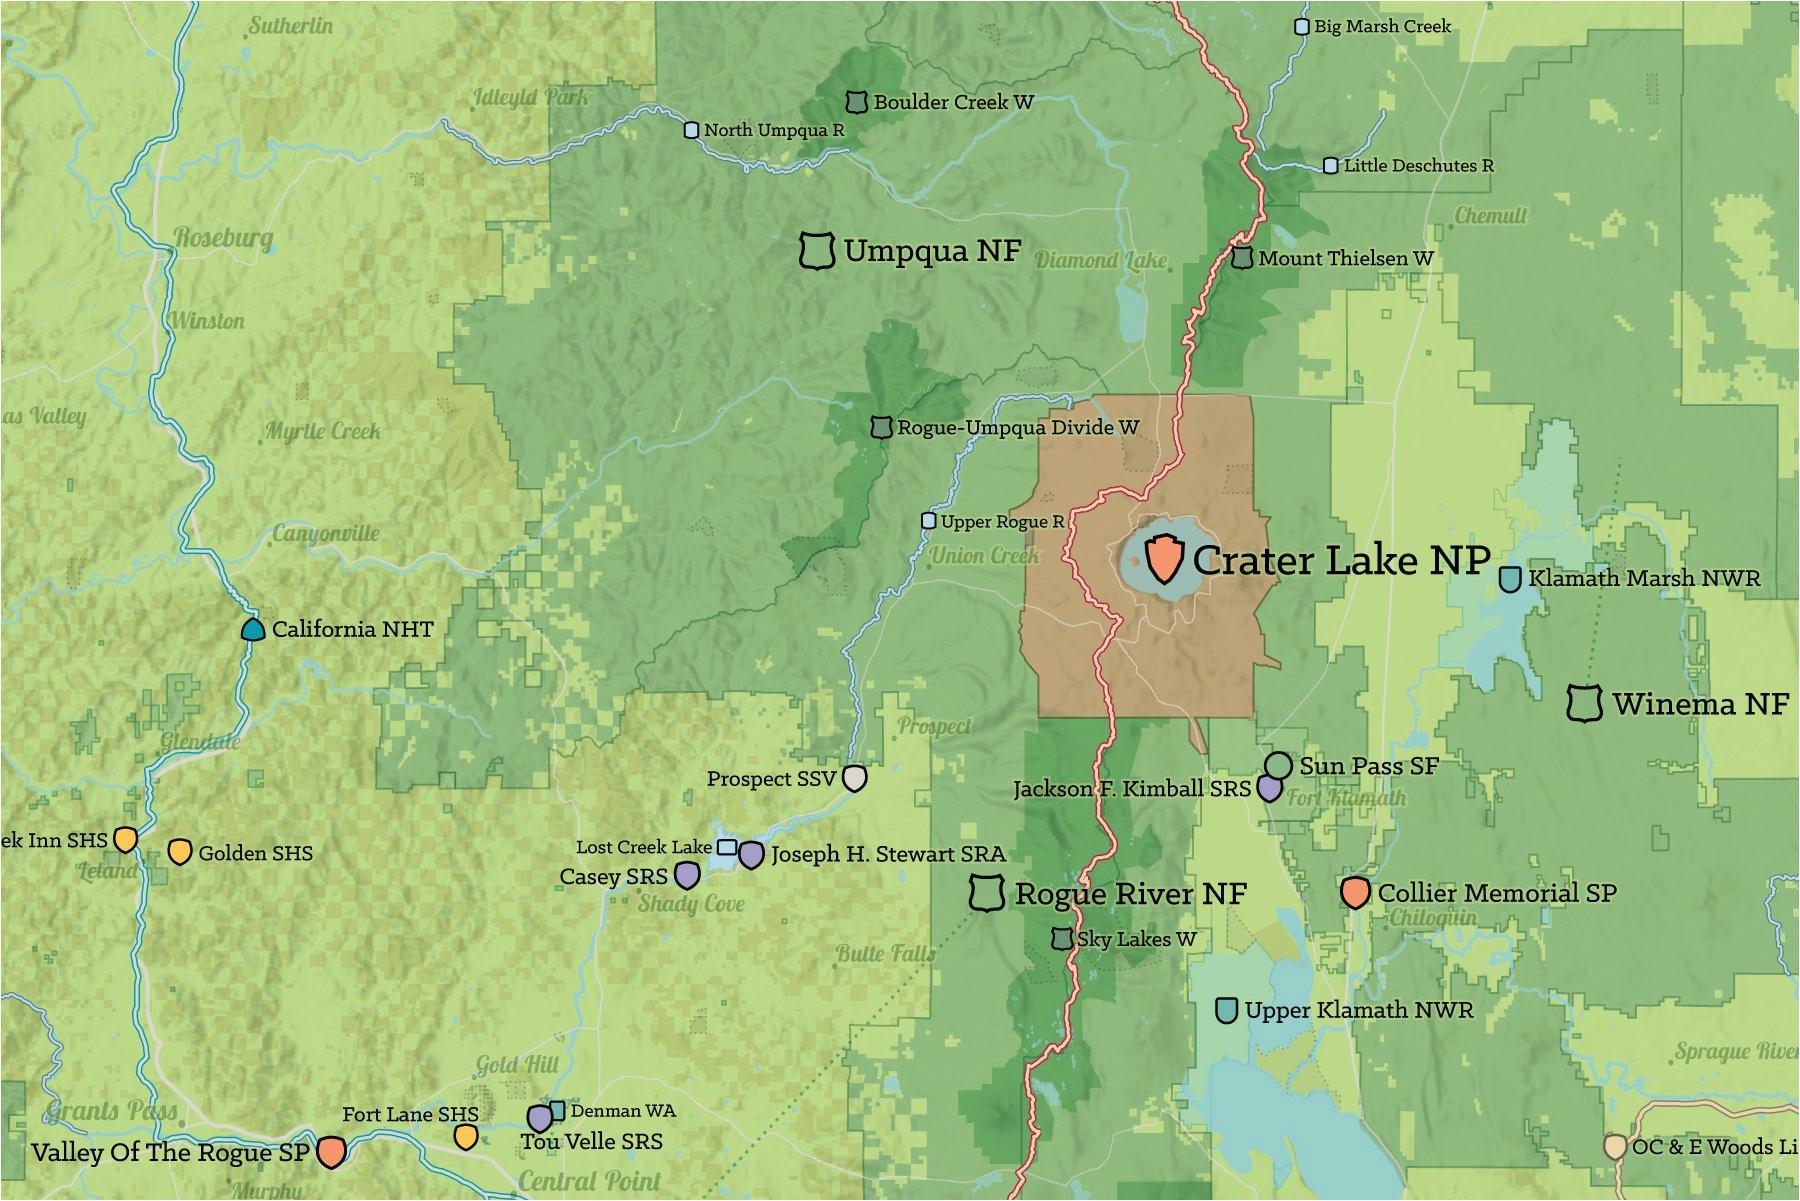 oregon state parks federal lands map 24x36 poster best maps ever